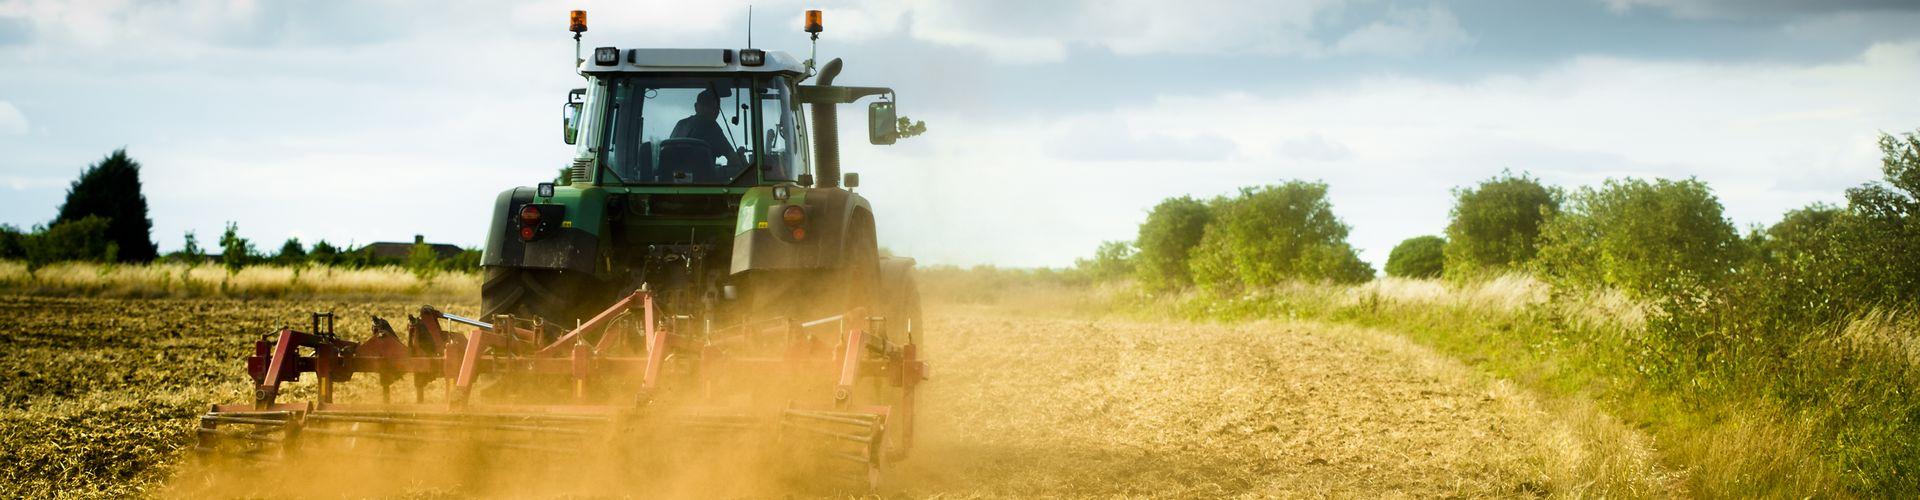 slider-3-traktor-servis